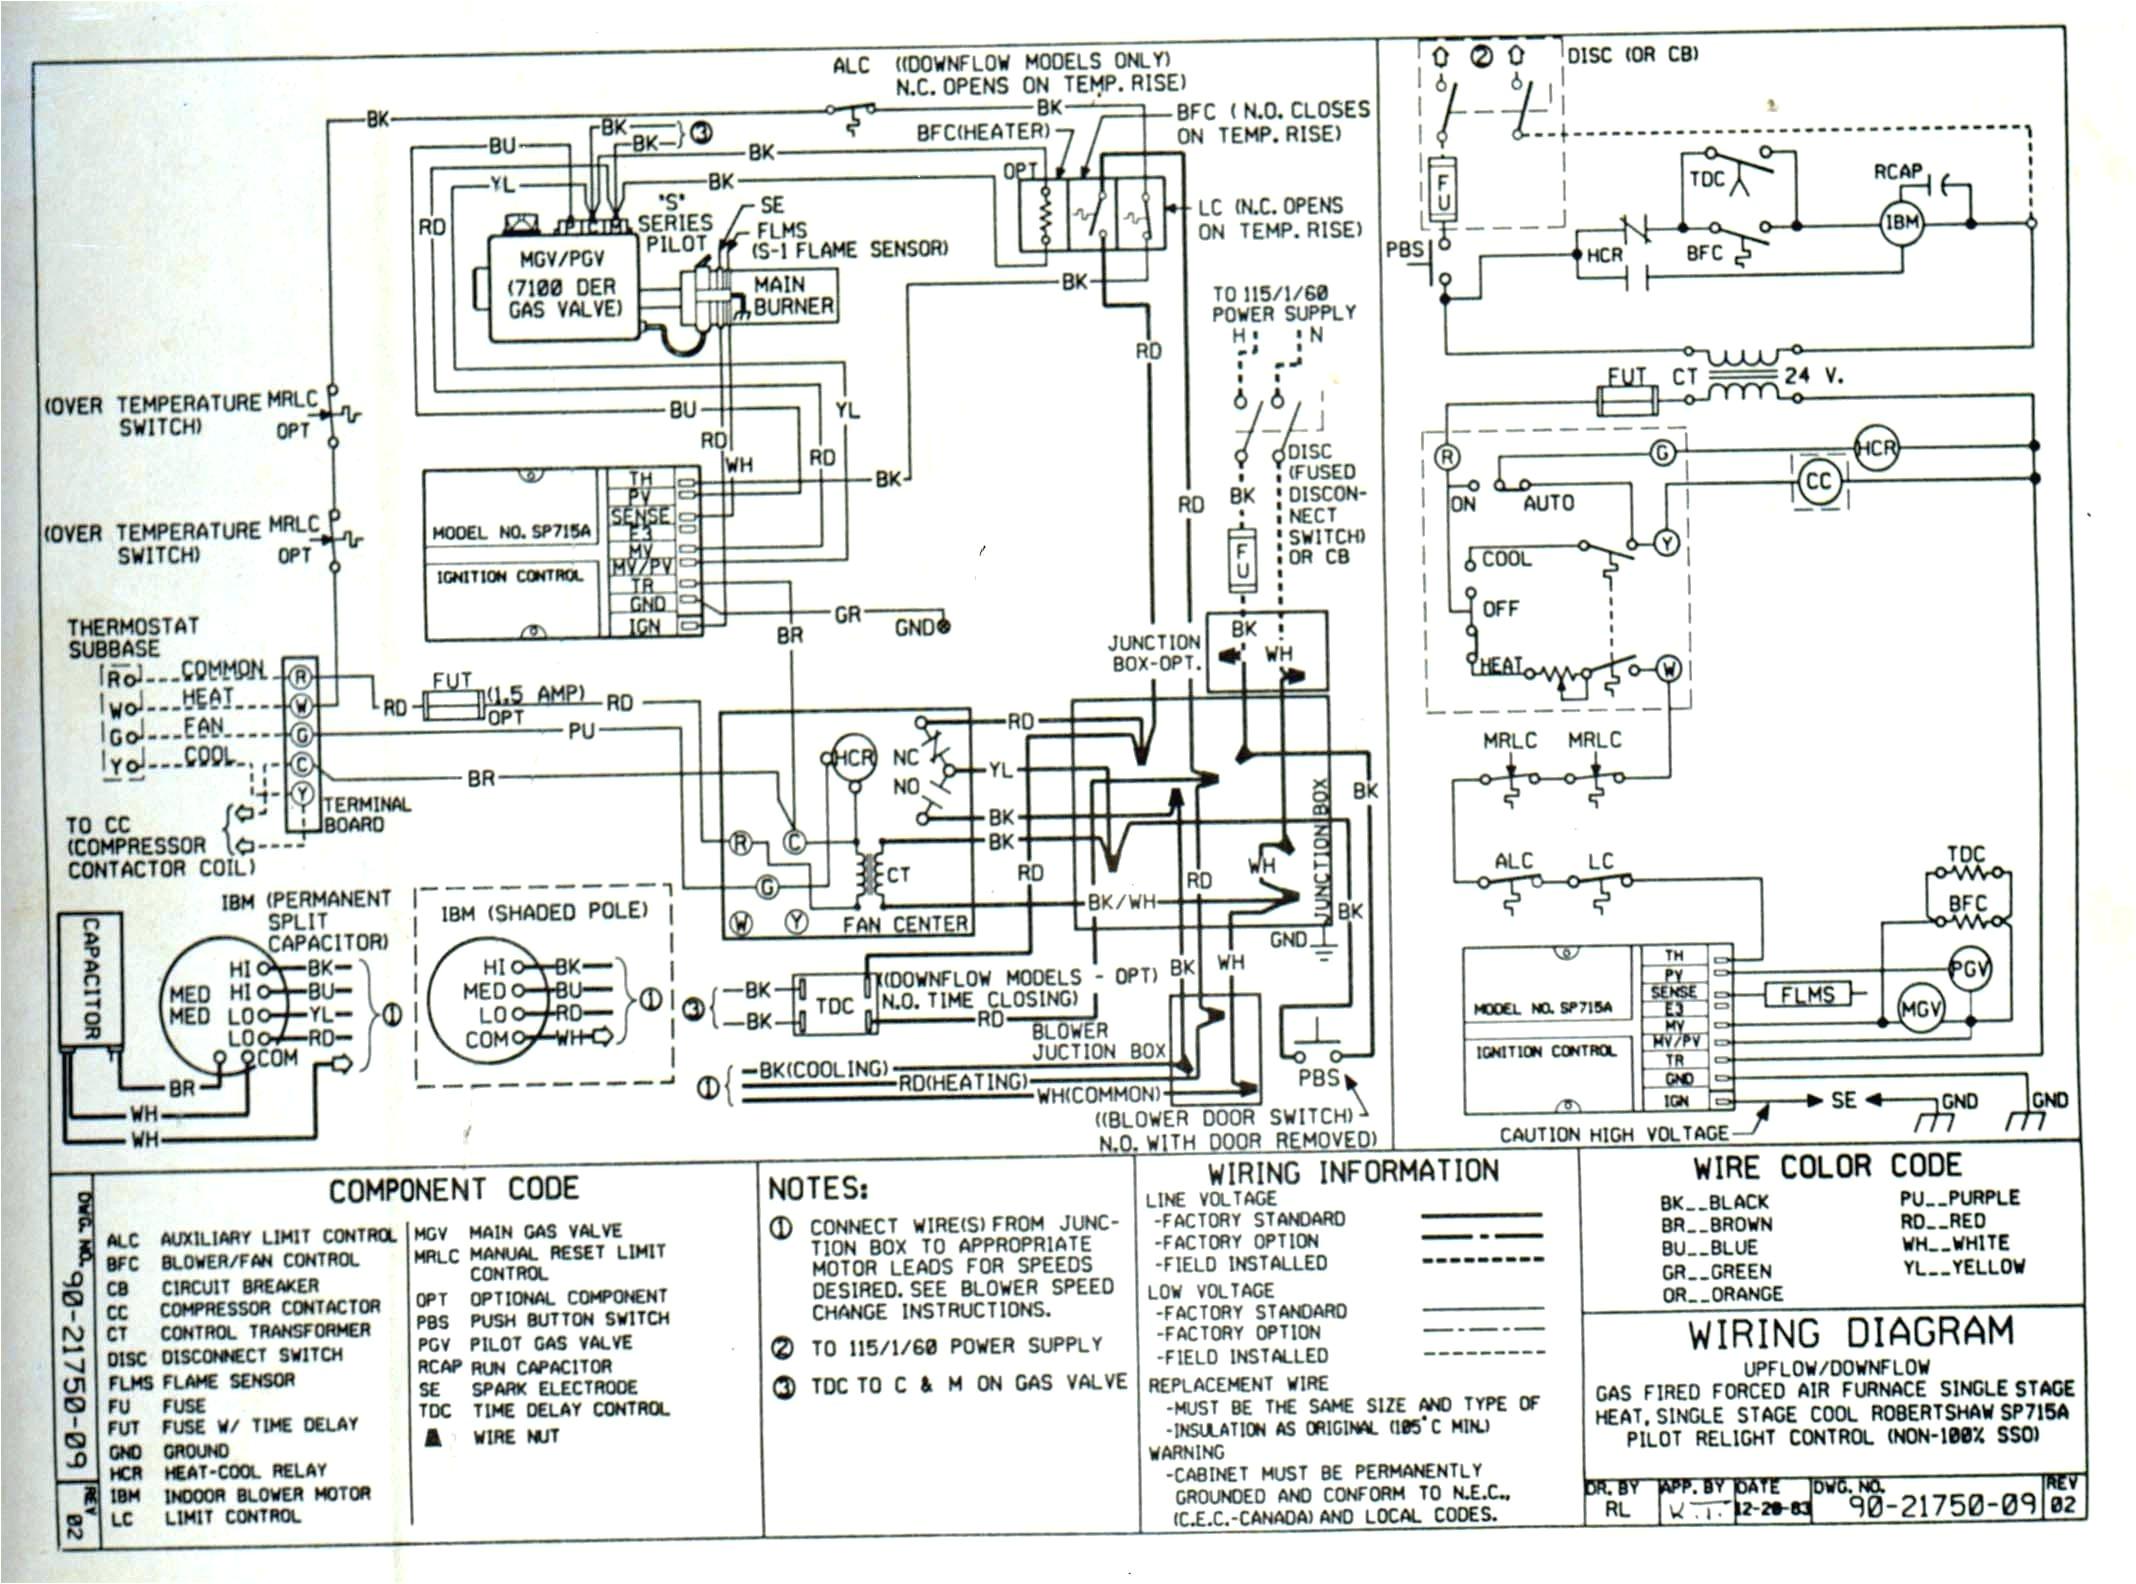 trane rooftop unit wiring diagram trane wiring diagrams model xr80 simple electronic circuits u2022 rh wiringdiagramone today trane hvac system wiring diagram trane hvac system wiring 1g jpg